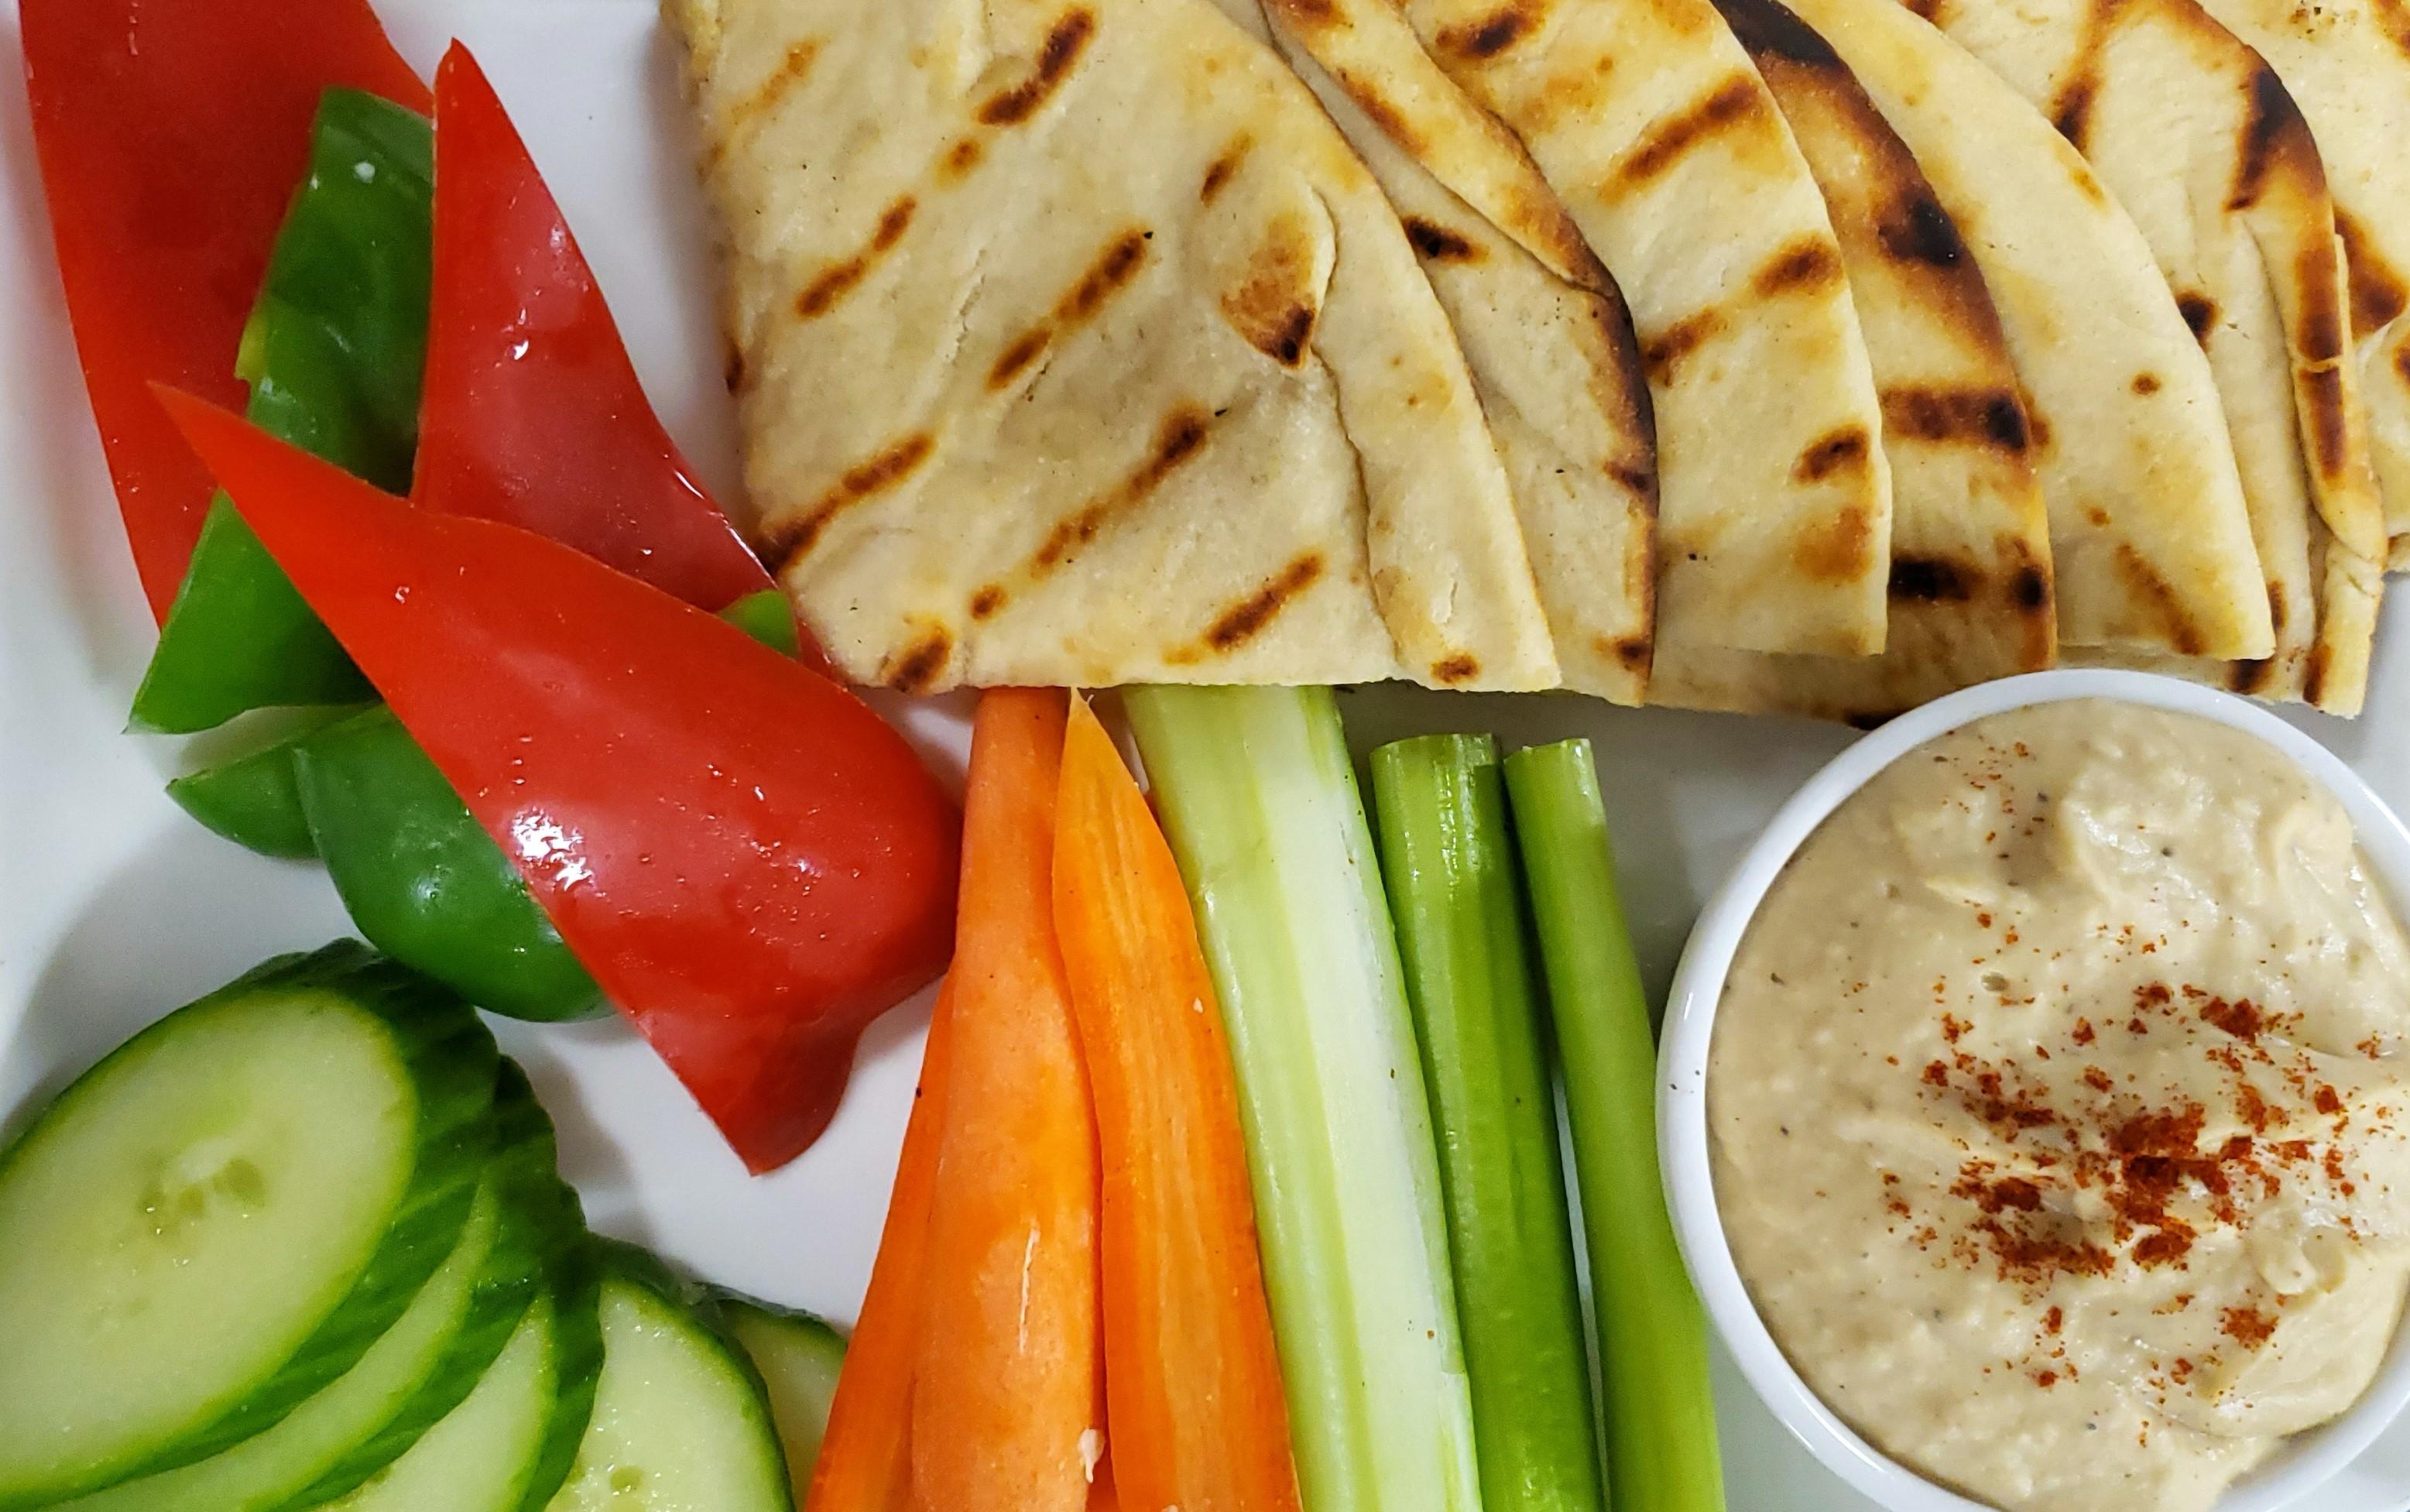 Sundial Hummus And Veggie Plate Recipe Sundial Beach Resort Spa Sanibel Island Florida Sundial Beach Resort Spa Sanibel Island Florida